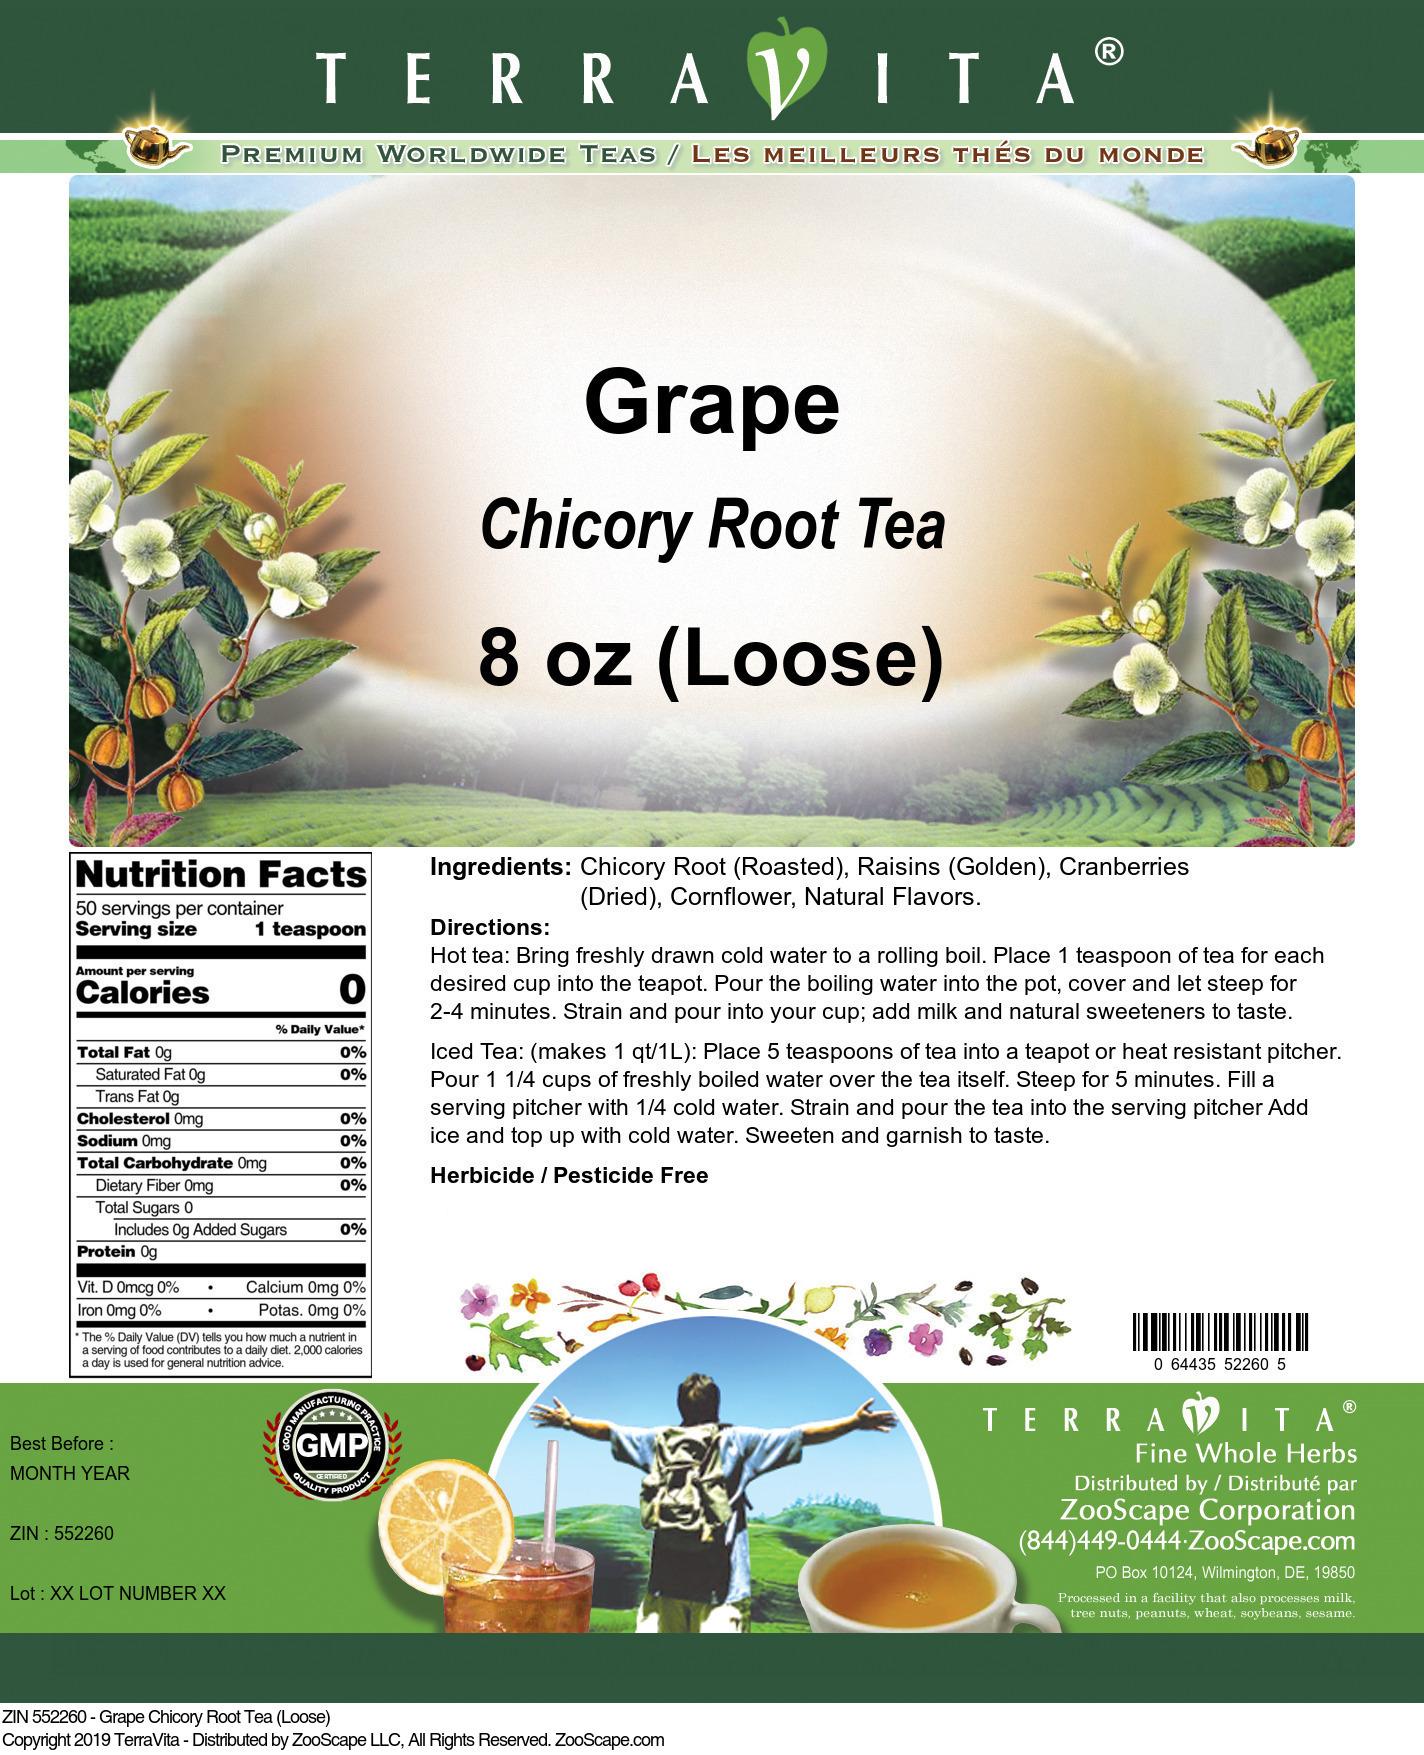 Grape Chicory Root Tea (Loose)